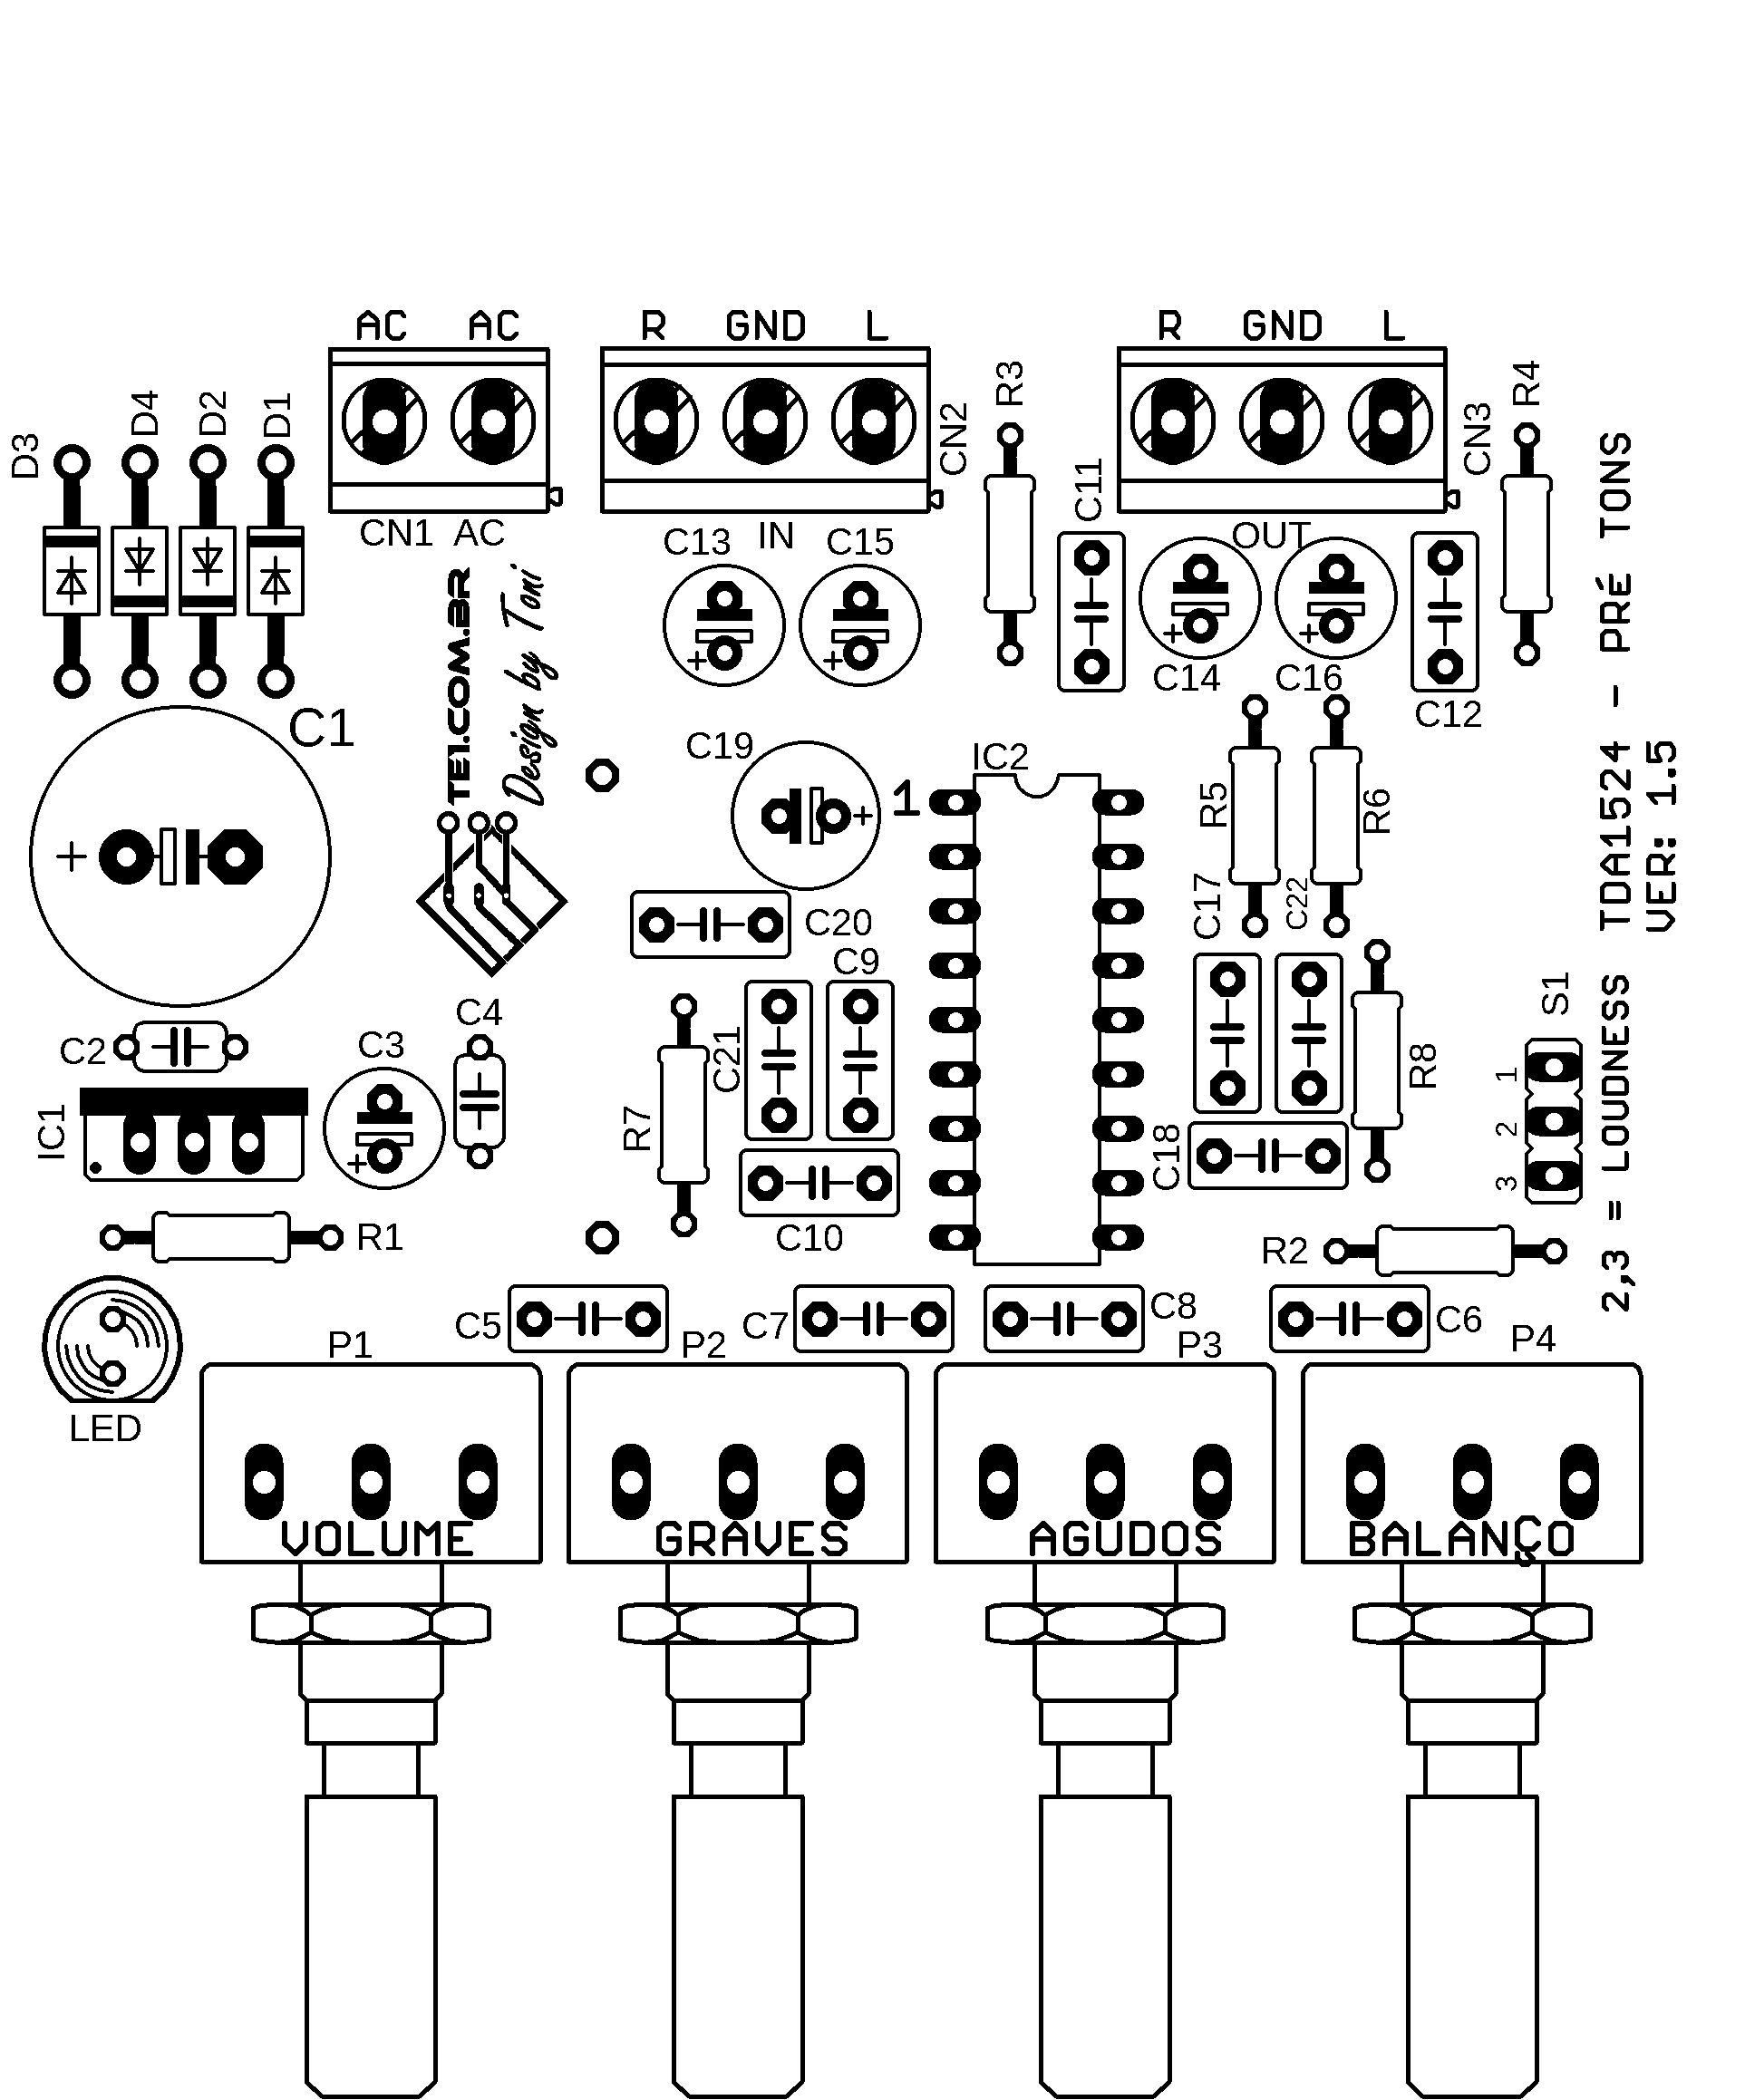 Cat C13 Belt Diagram together with 3ah26 Serpentine Belt Diagram likewise Guitar Chord Chart 2015 moreover Crosman Pellet Gun Parts Diagram additionally 2015 0214 032. on c11